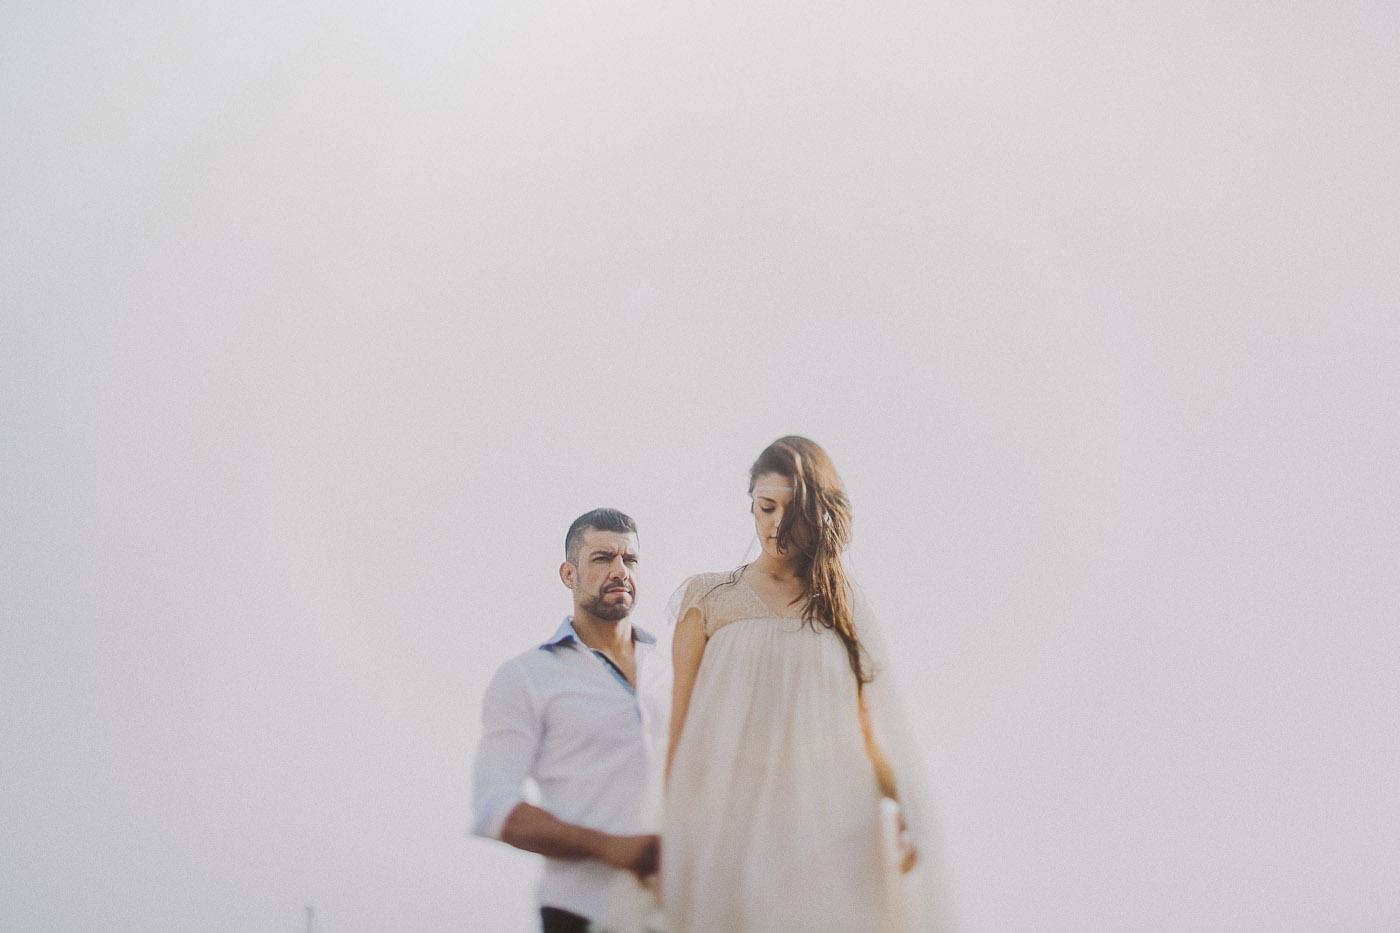 canary-islands-wedding-photographer-14